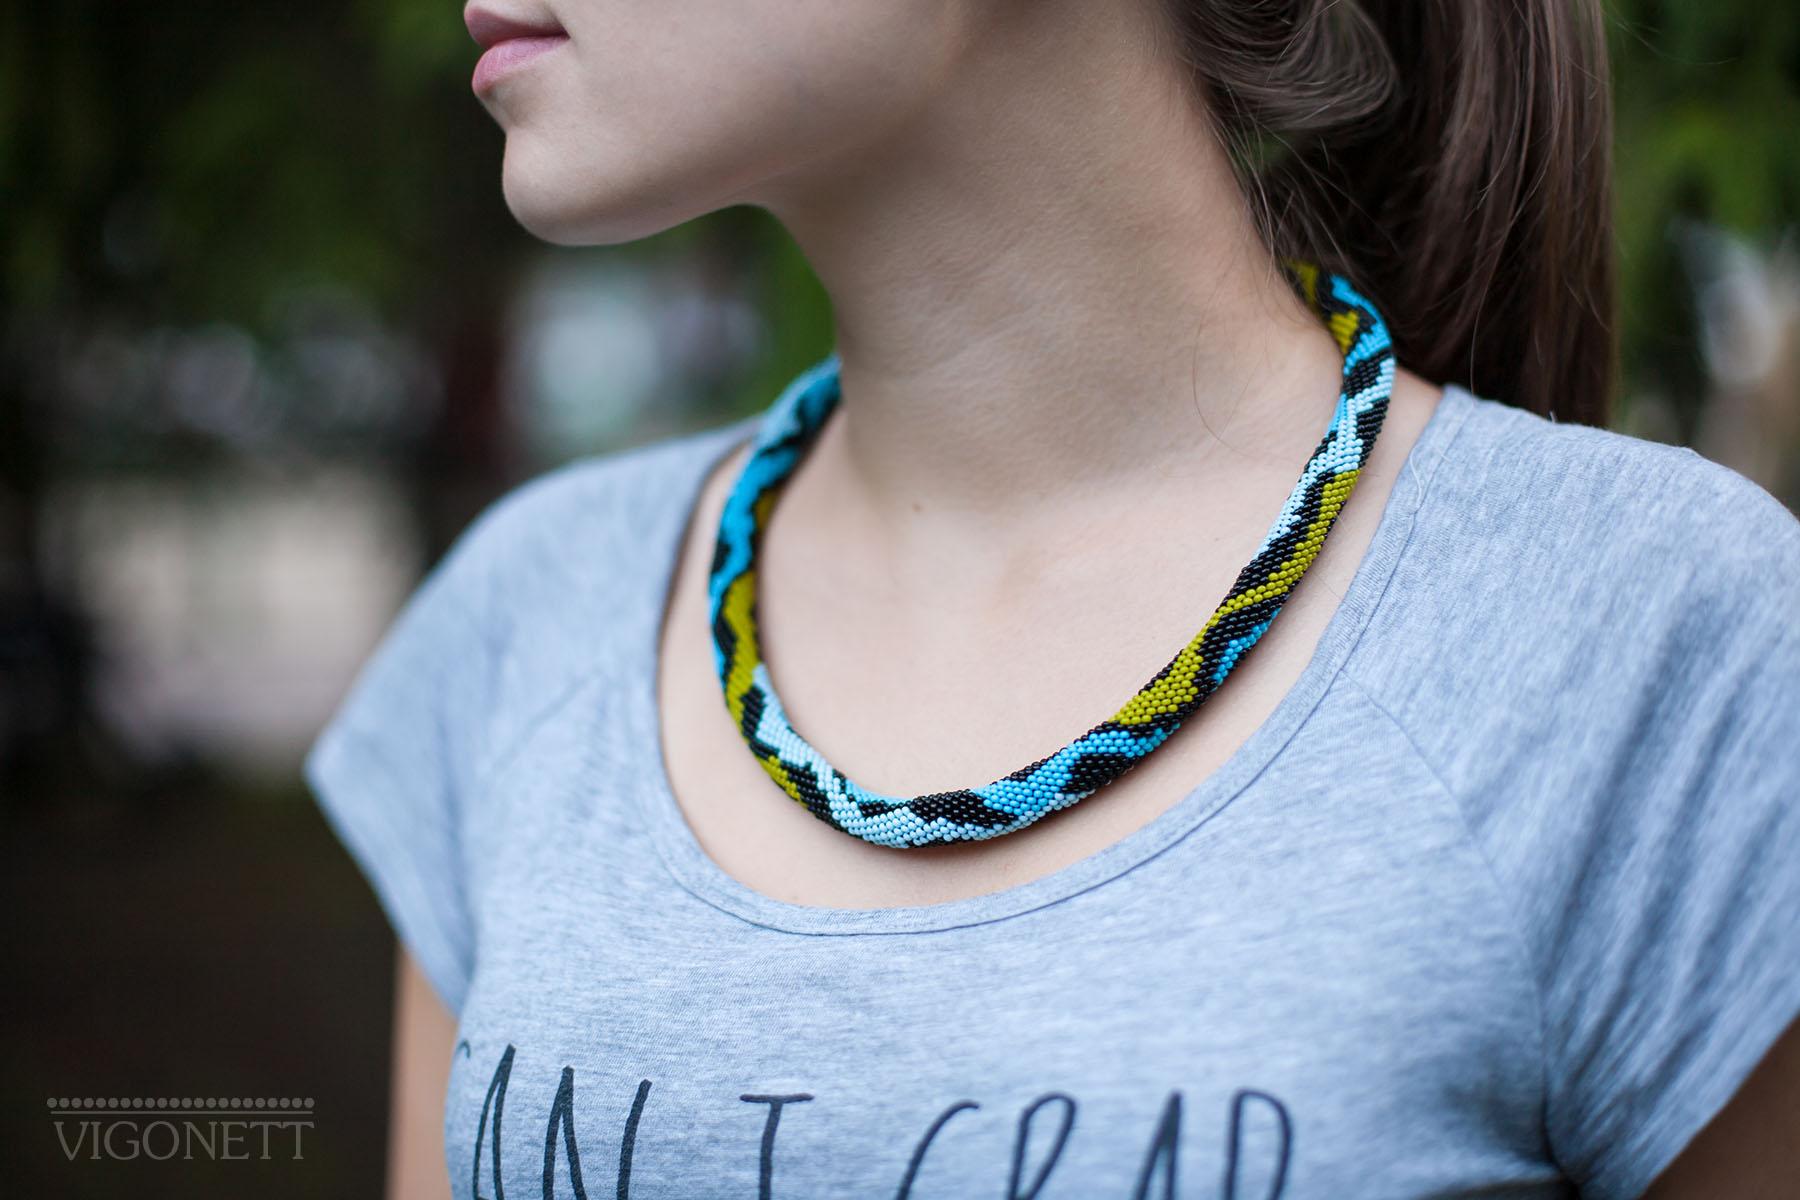 Necklace Waves by Vigonett